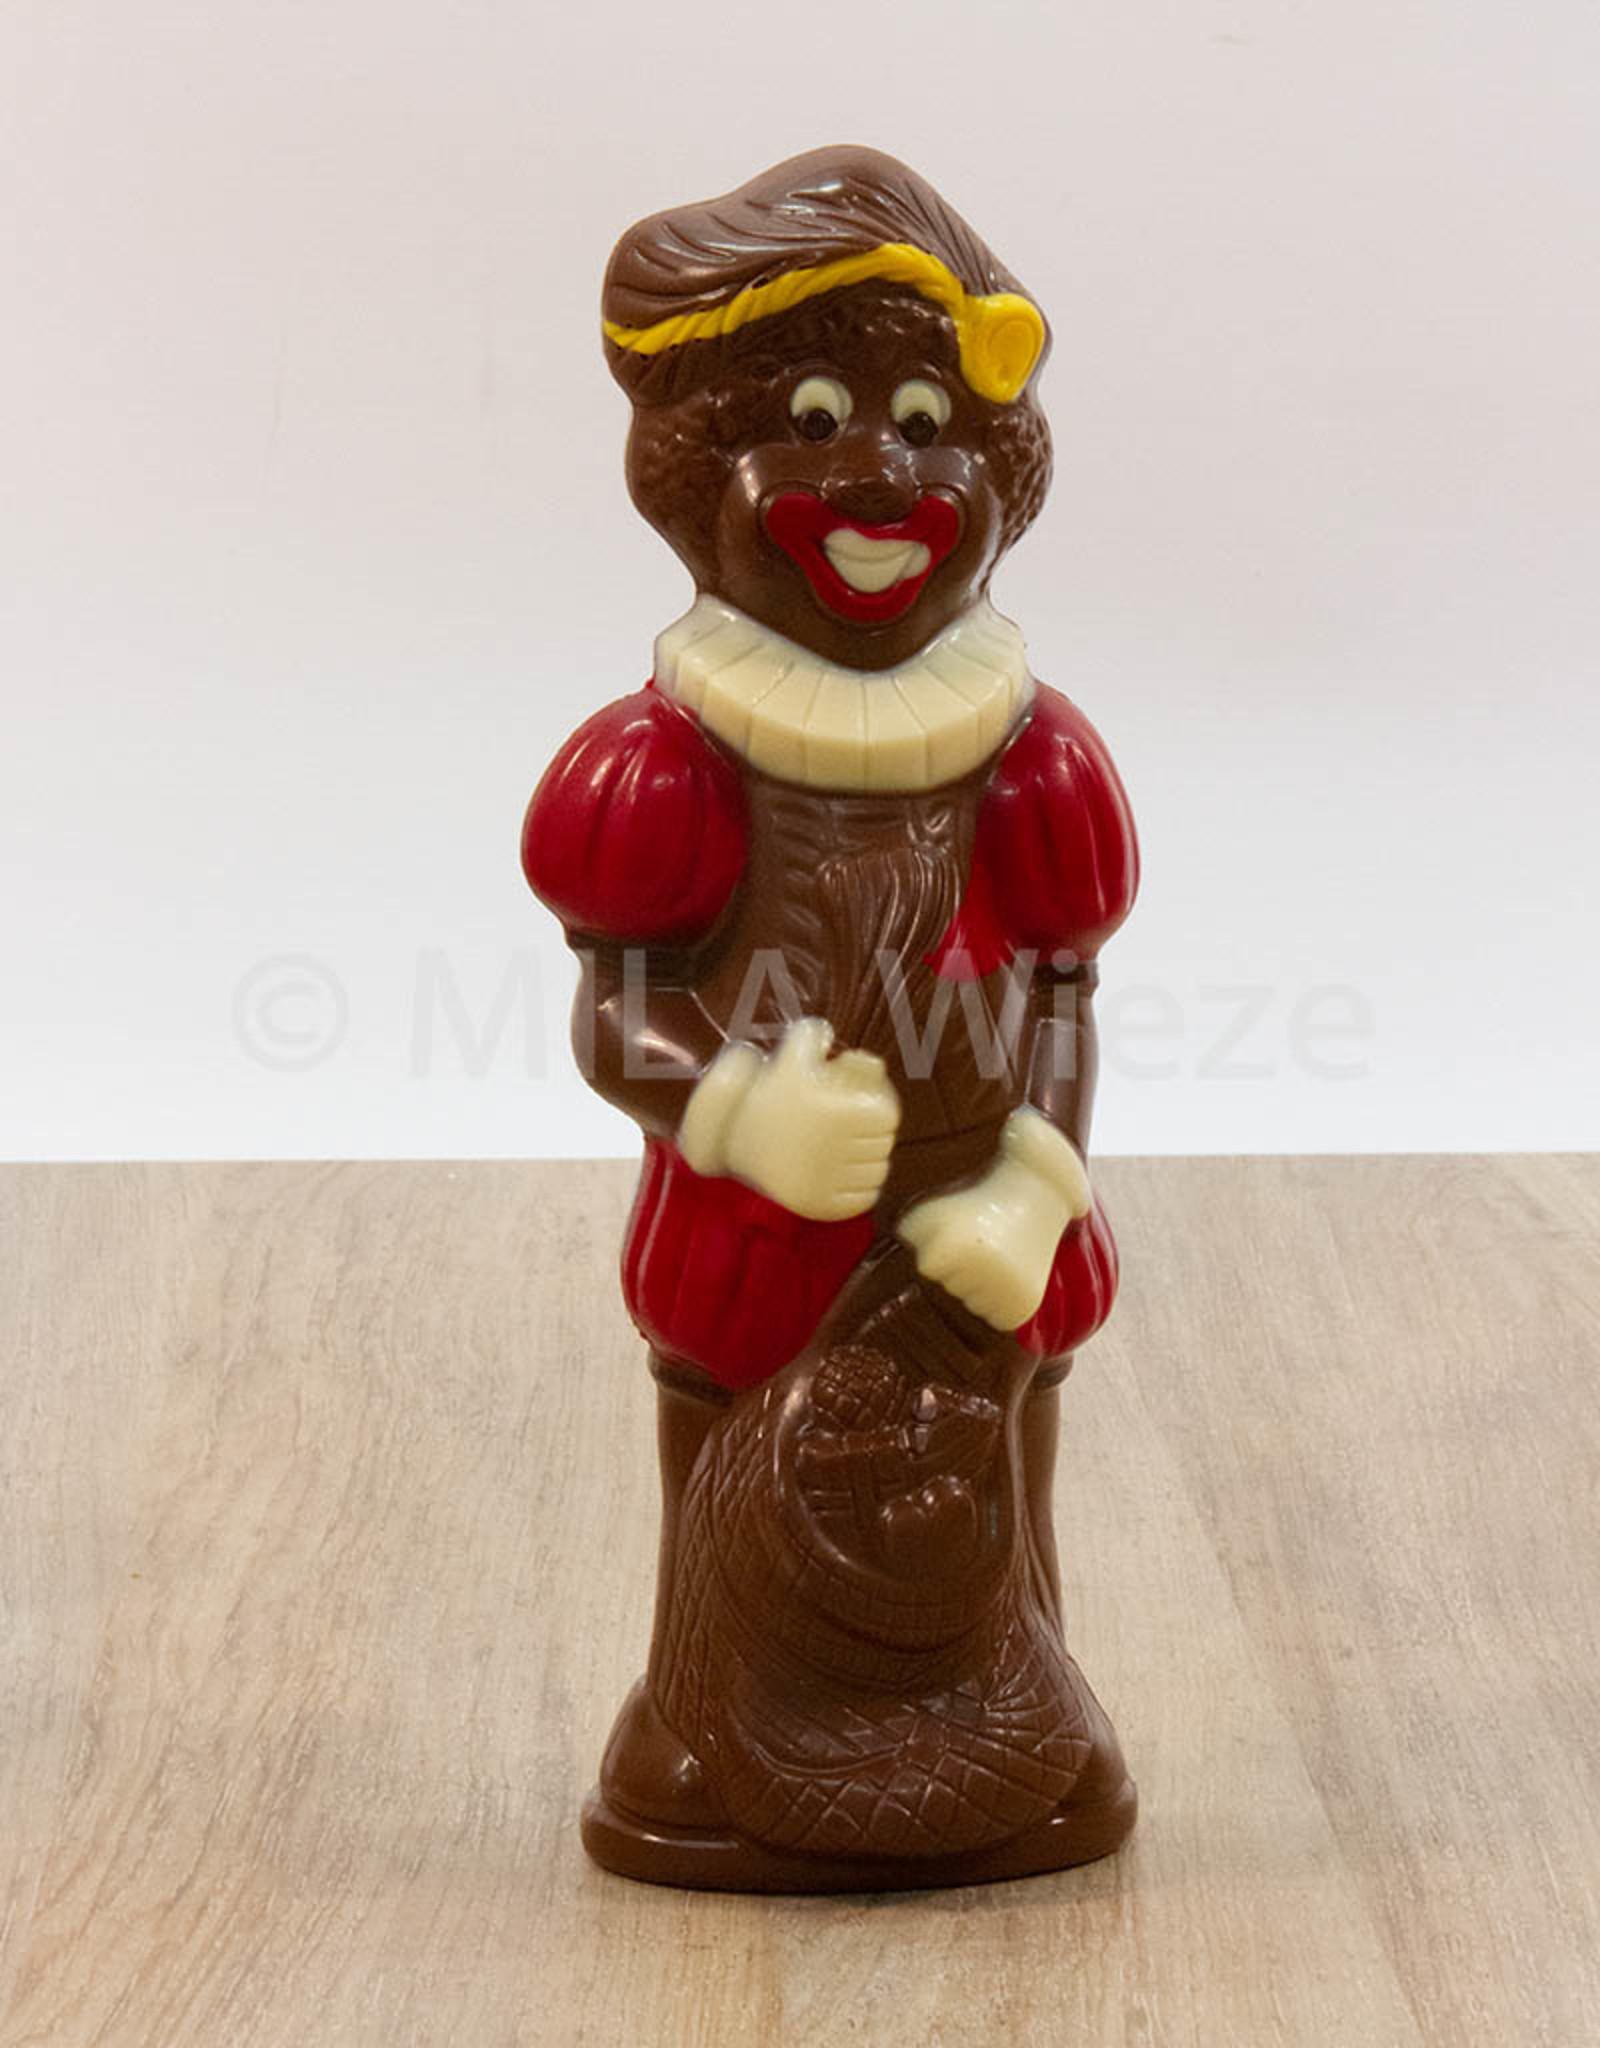 Lachende piet deco - 90 gr - 18 cm - melkchocolade